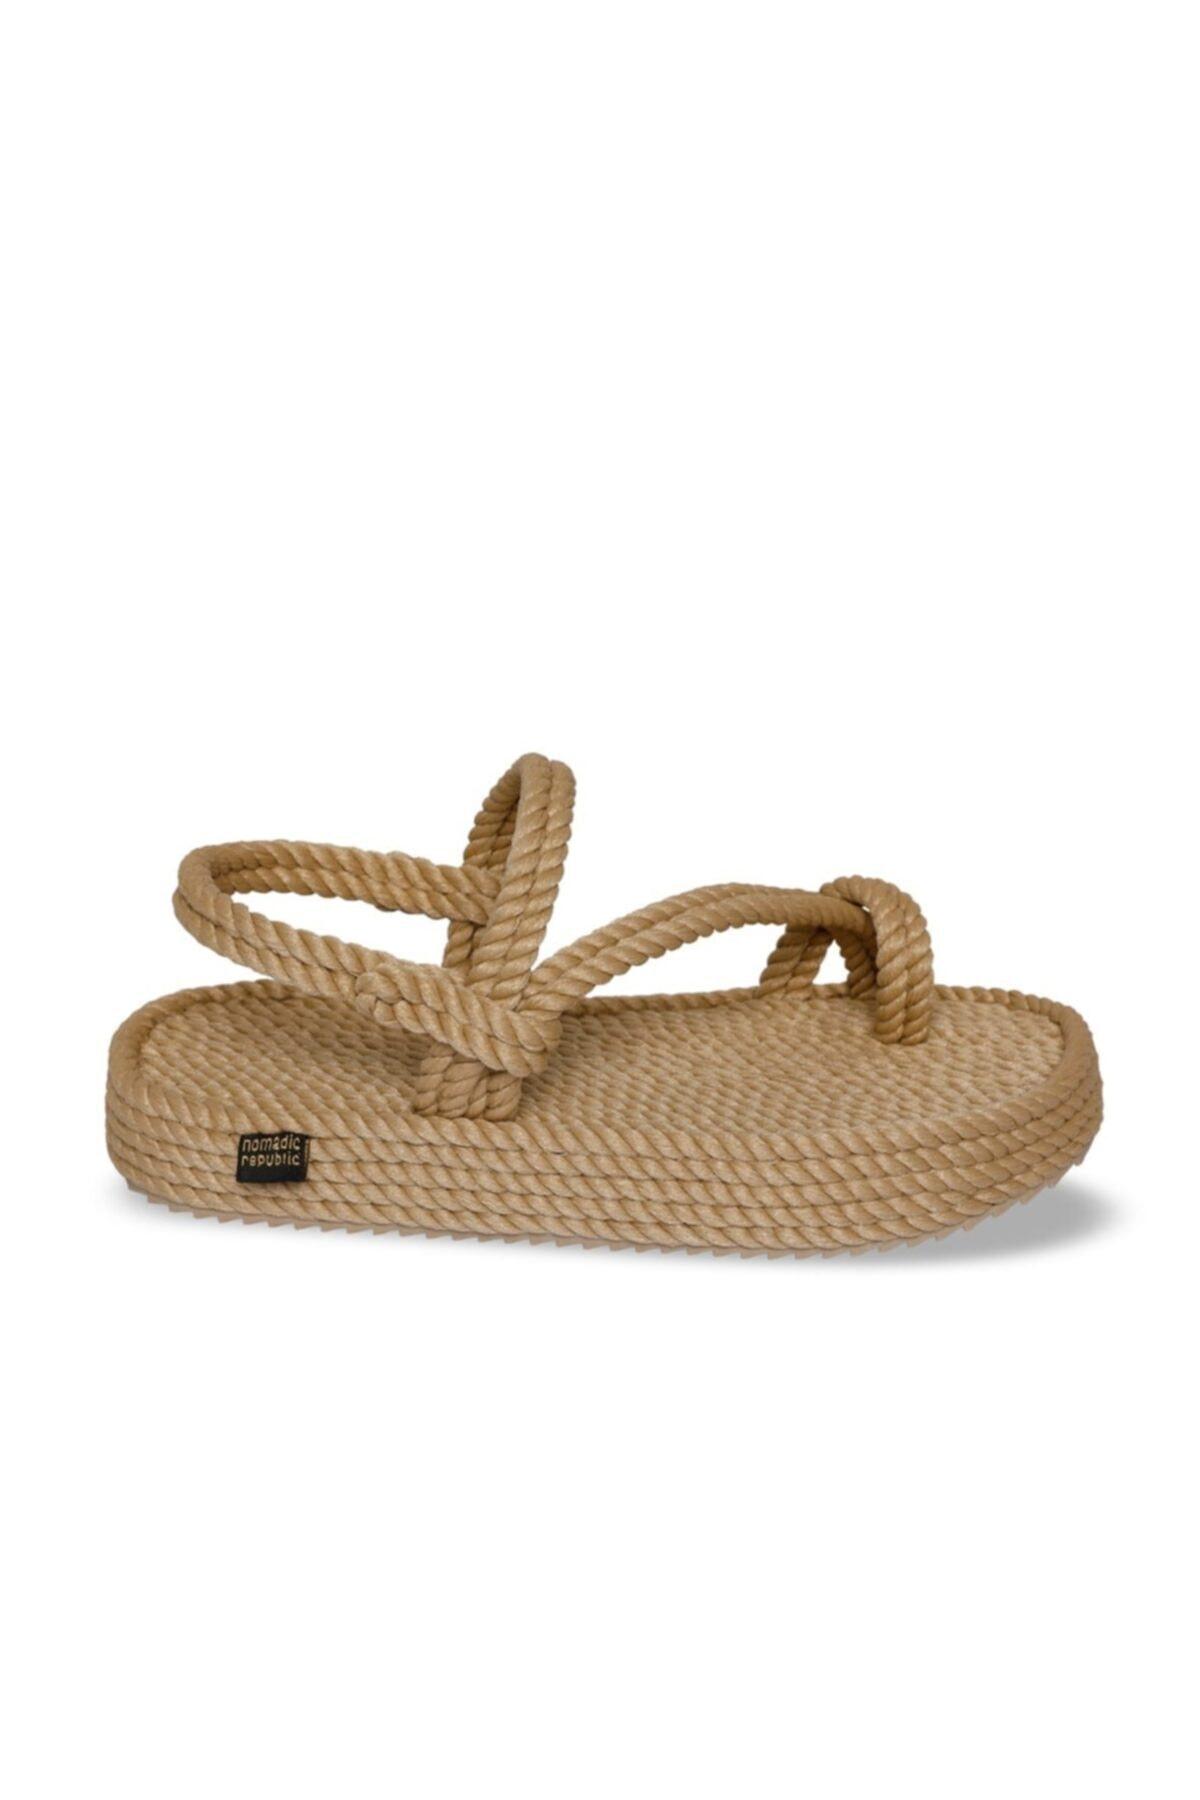 Nomadic Republic Hawaii Platform Kadın Halat & İp Sandalet - Bej 2